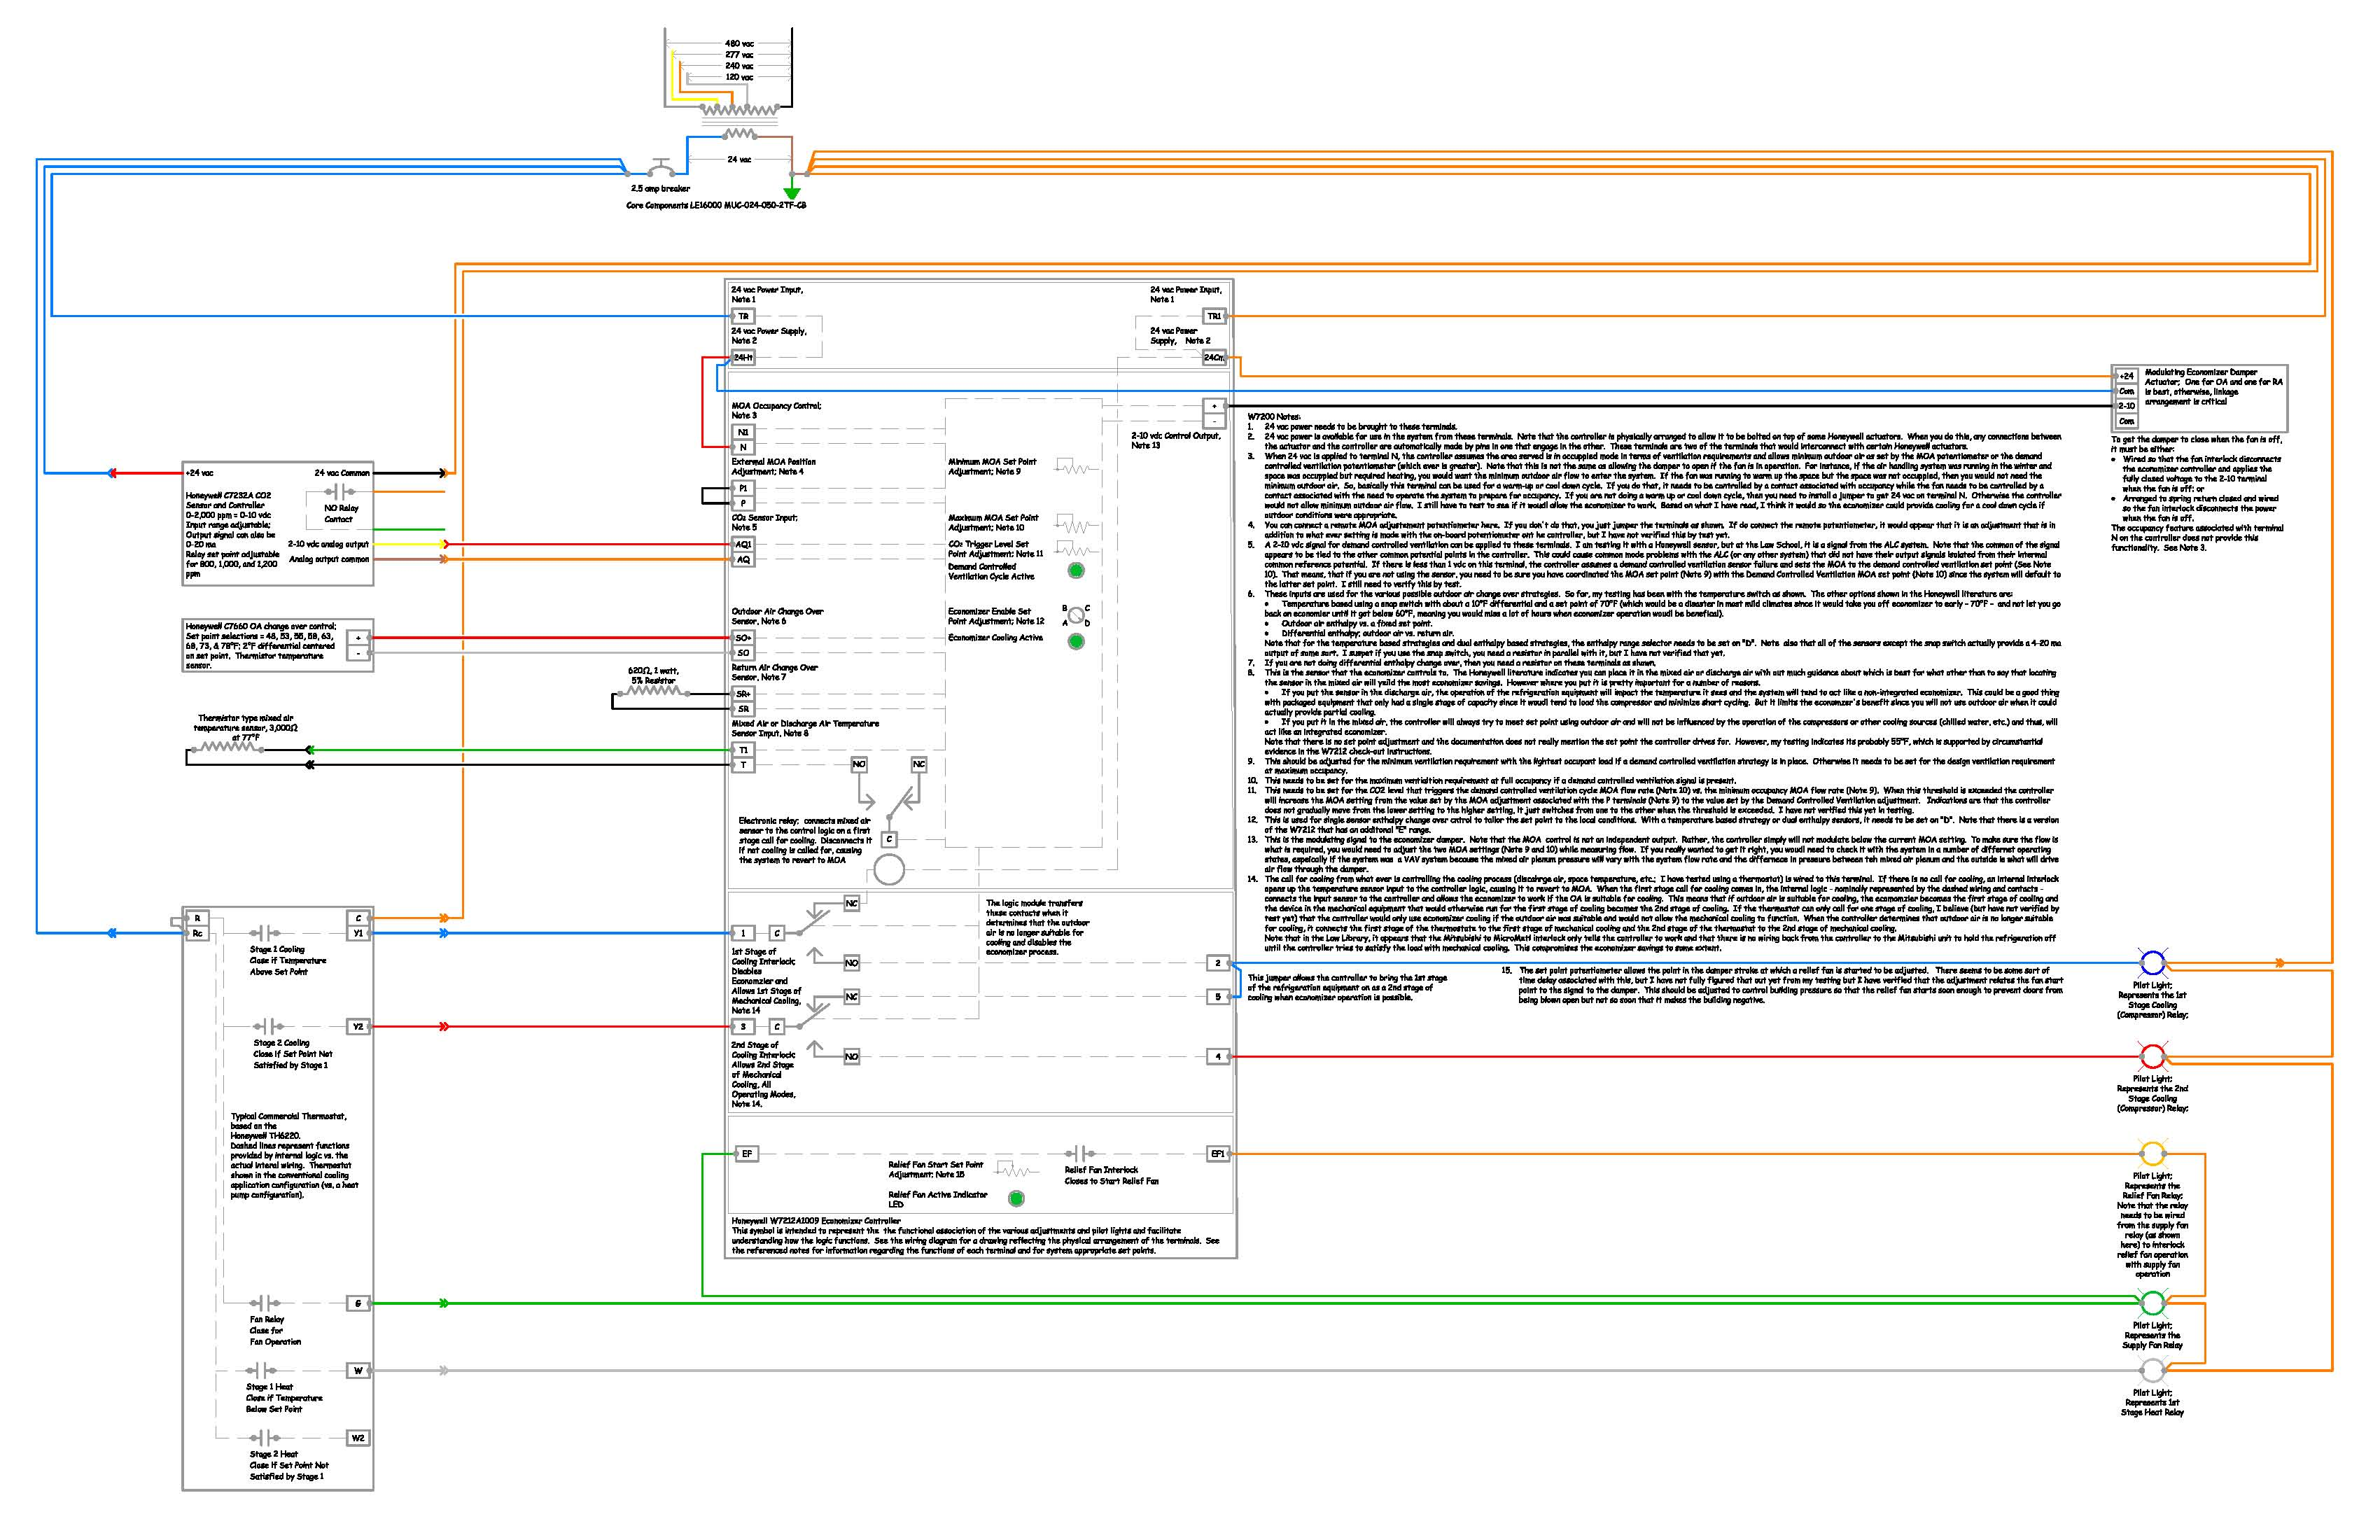 economizer trainer wiring diagram v3?w\=640\&h\=414 carrier 48 series economizer wiring diagram how google works  at pacquiaovsvargaslive.co